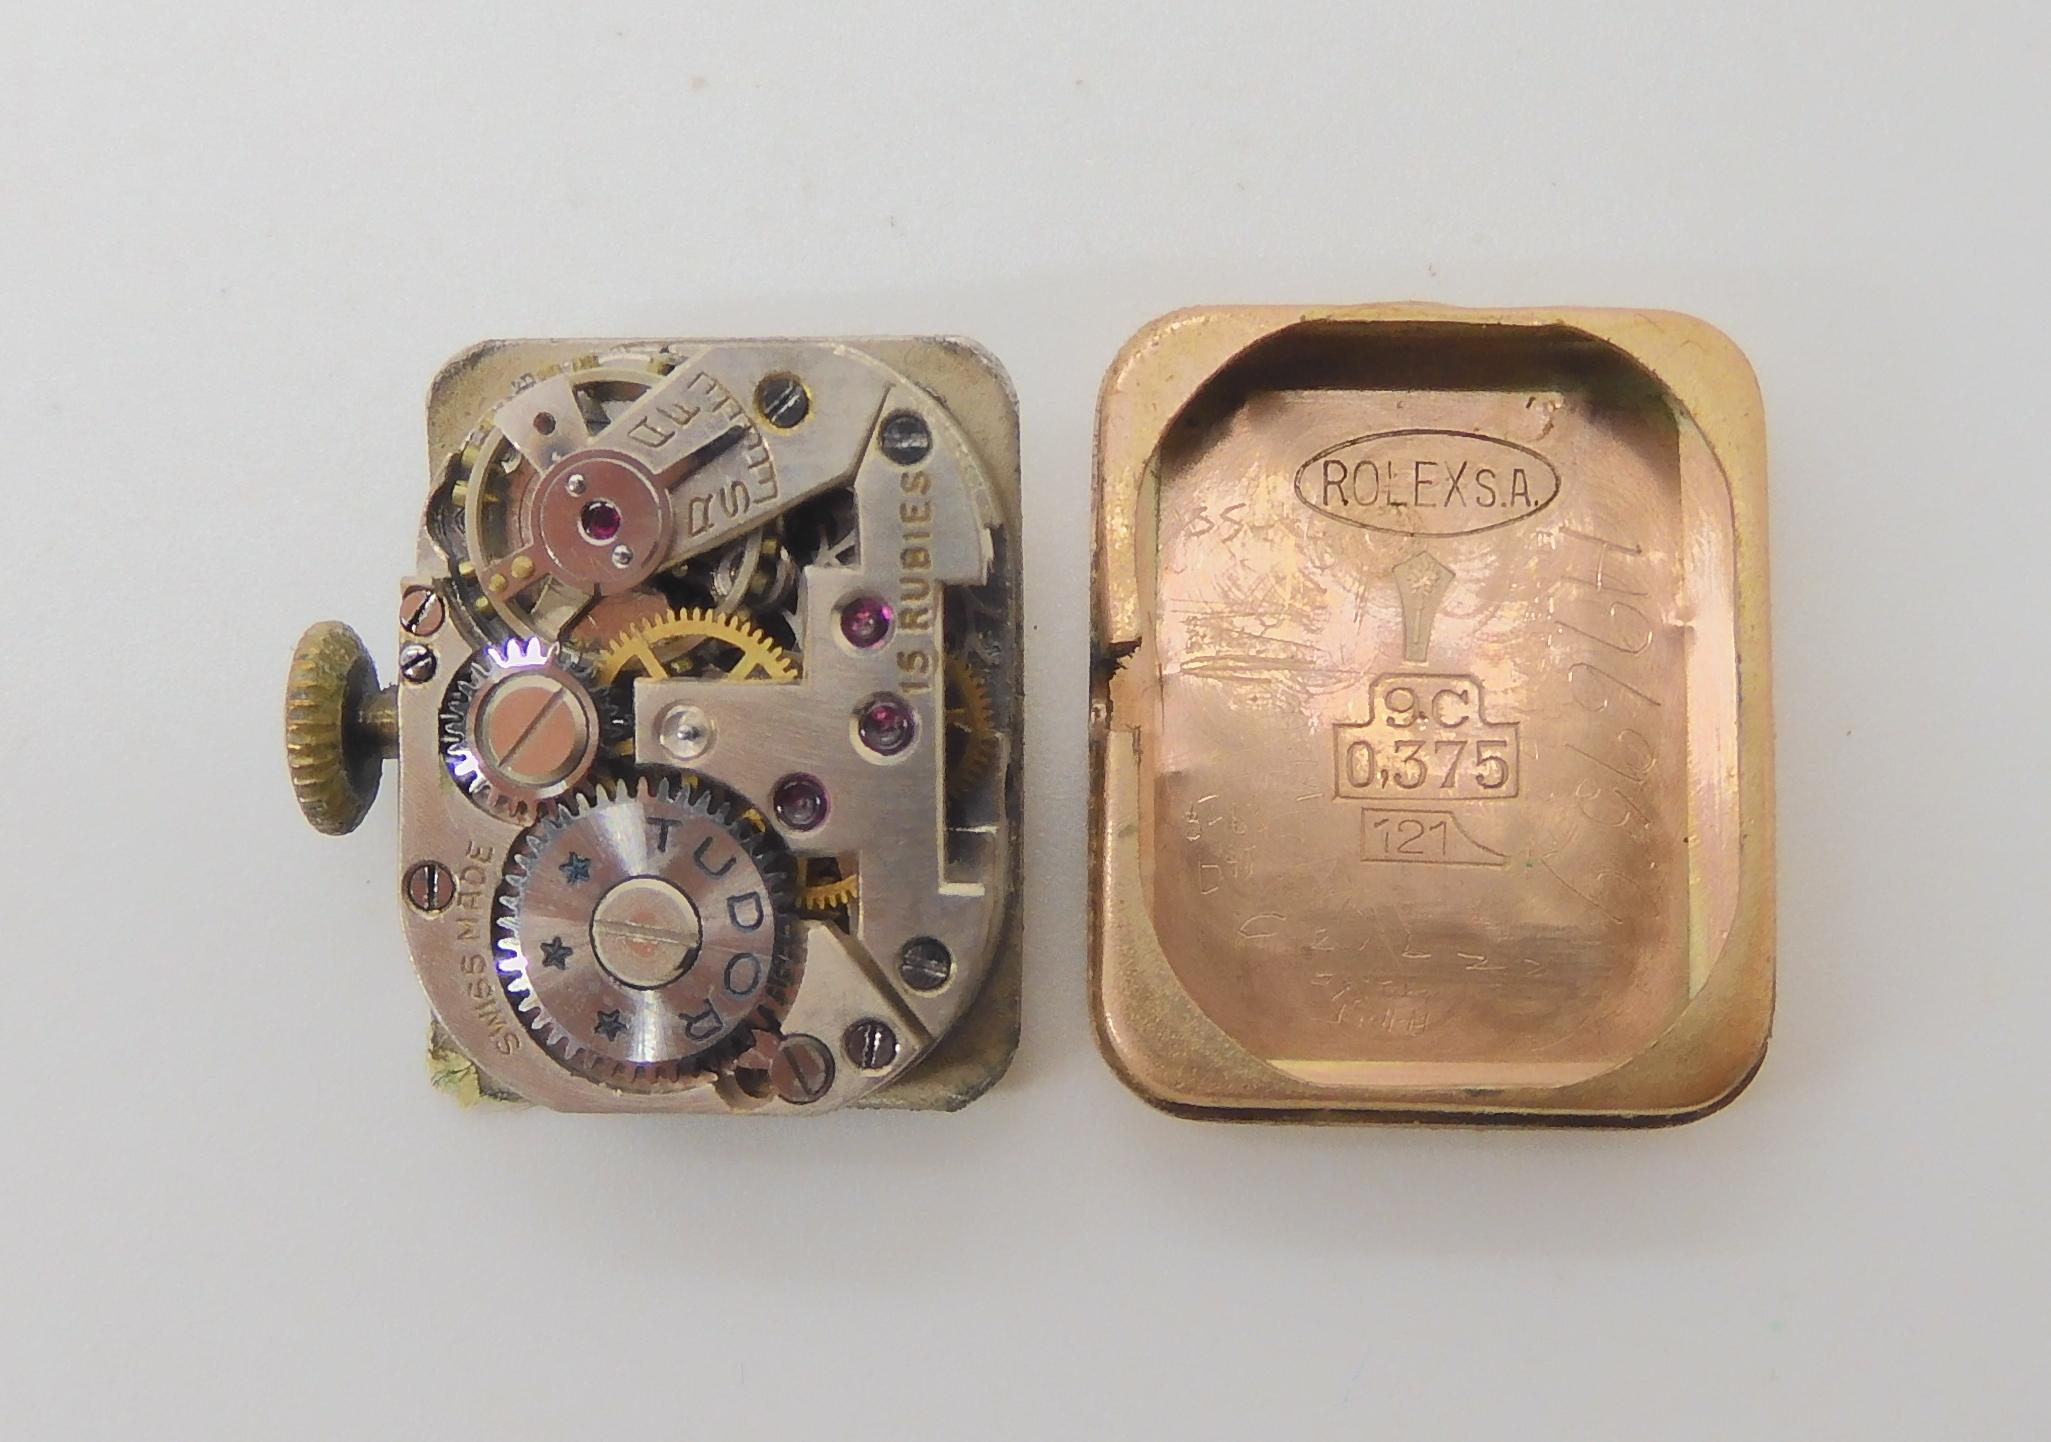 A 9CT GOLD LADIES TUDOR WRISTWATCH the dial signed Tudor Dobbies Ltd Nairobi. with black roman - Image 3 of 3